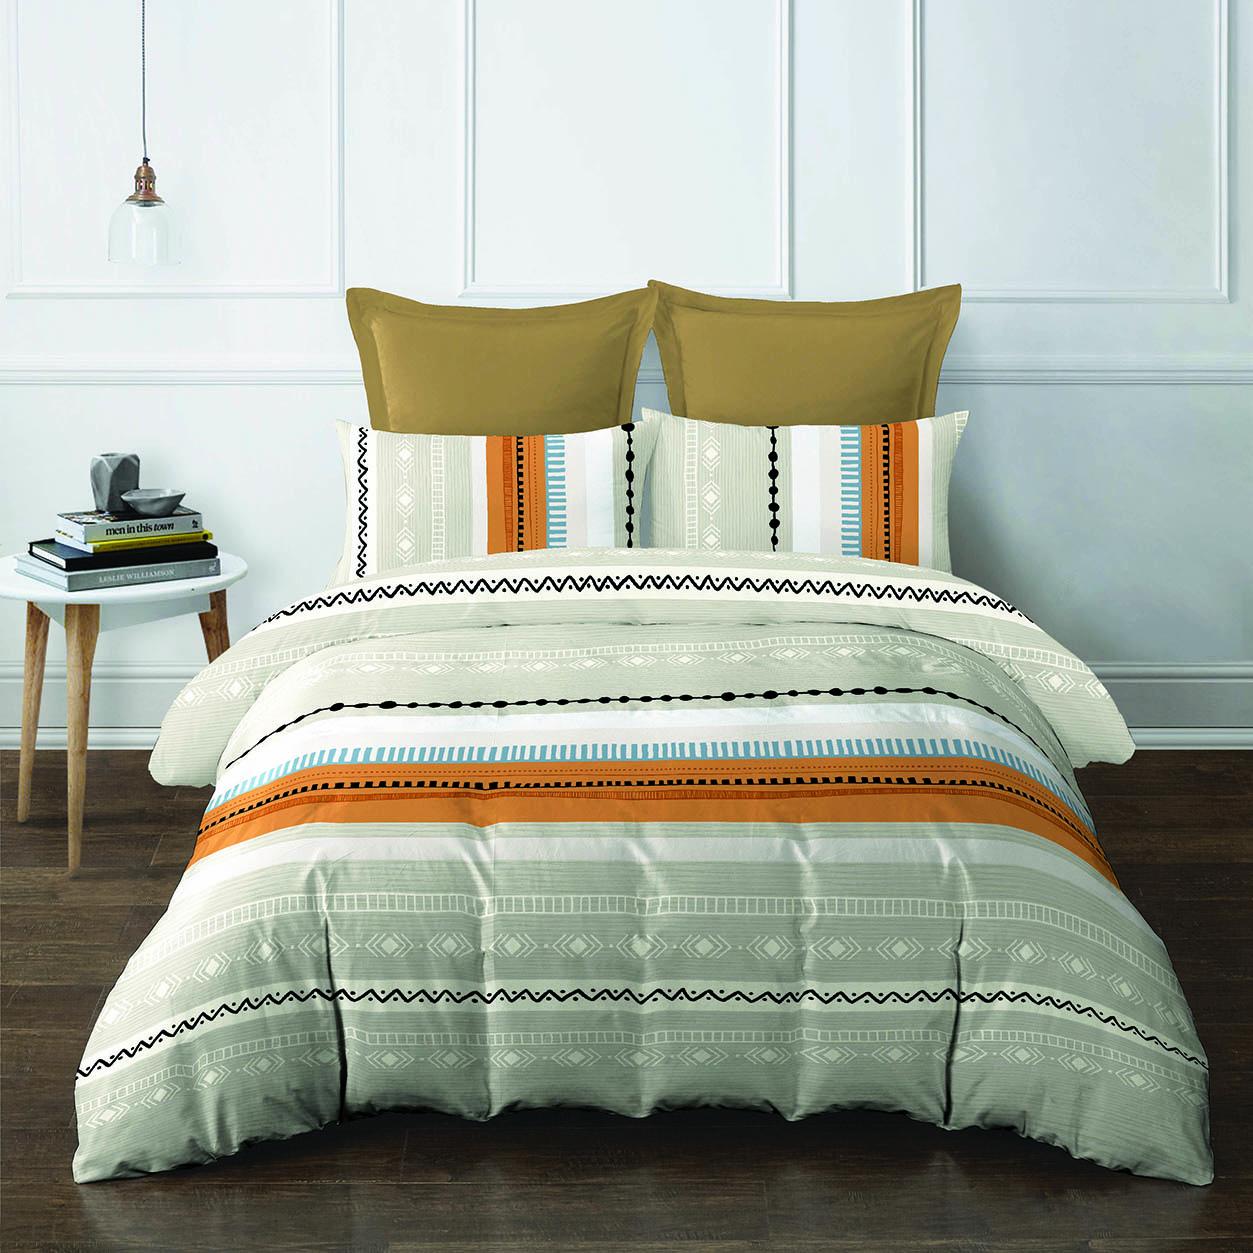 5pcs Queen Comforter Set (420 thread count, smooth cotton) - Andela